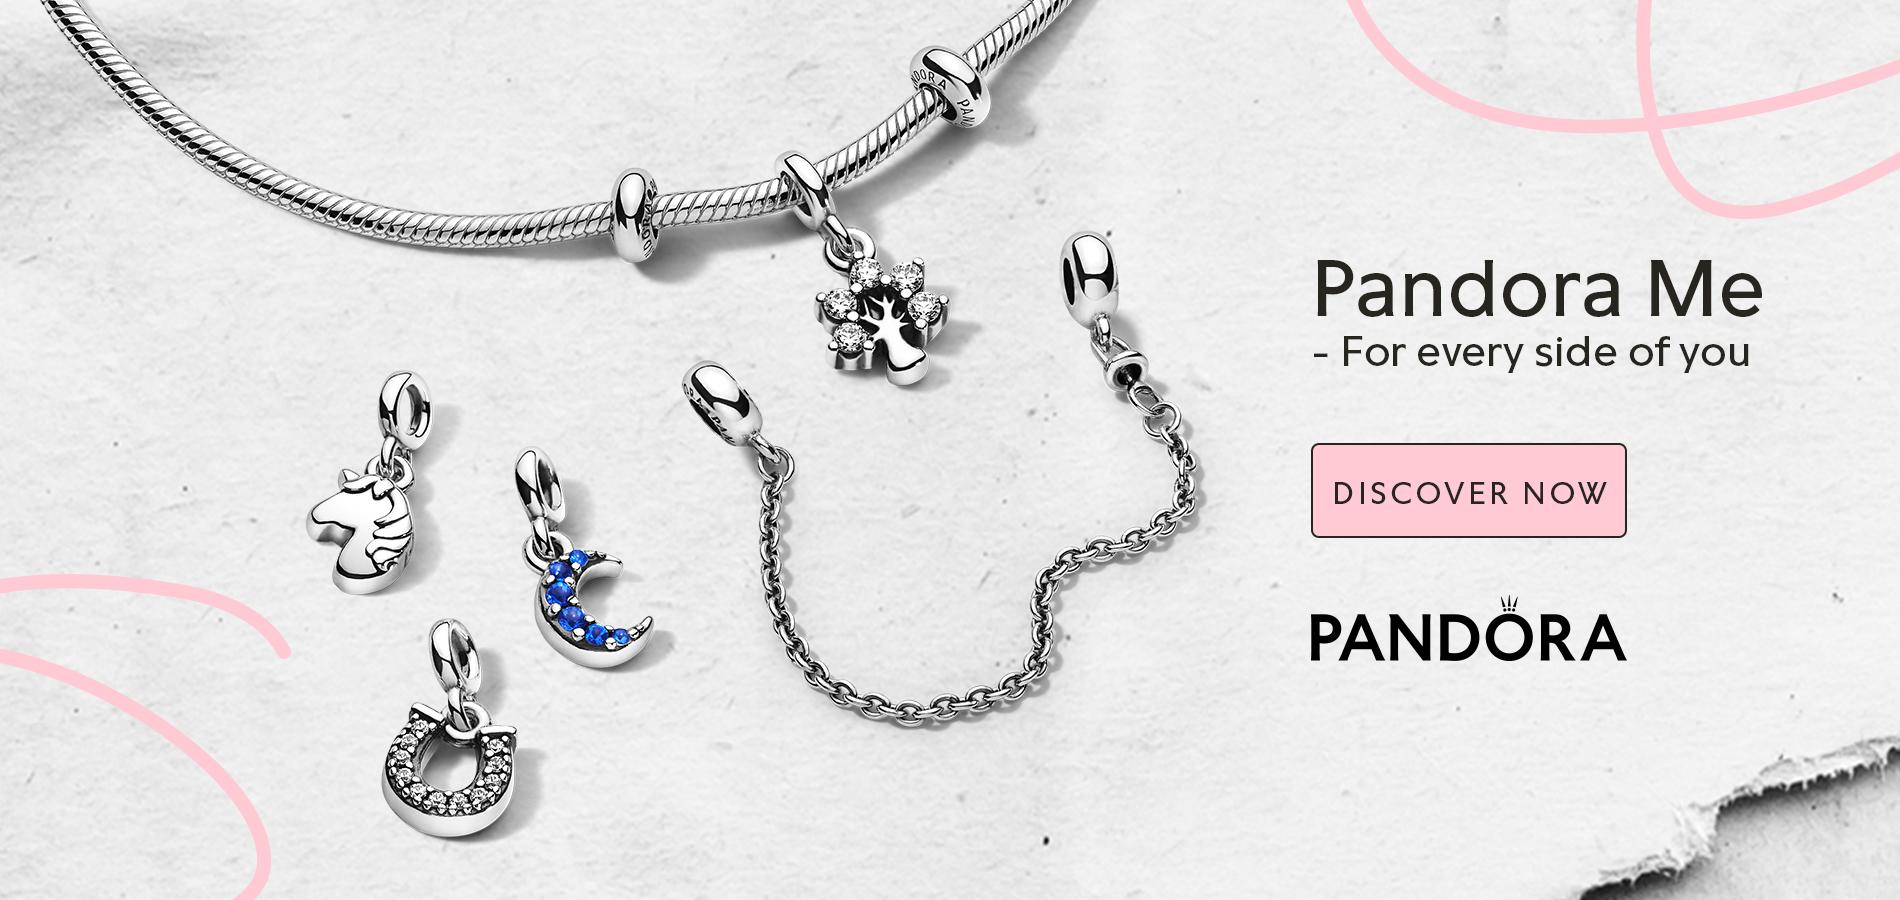 Pandora Reflexions of You